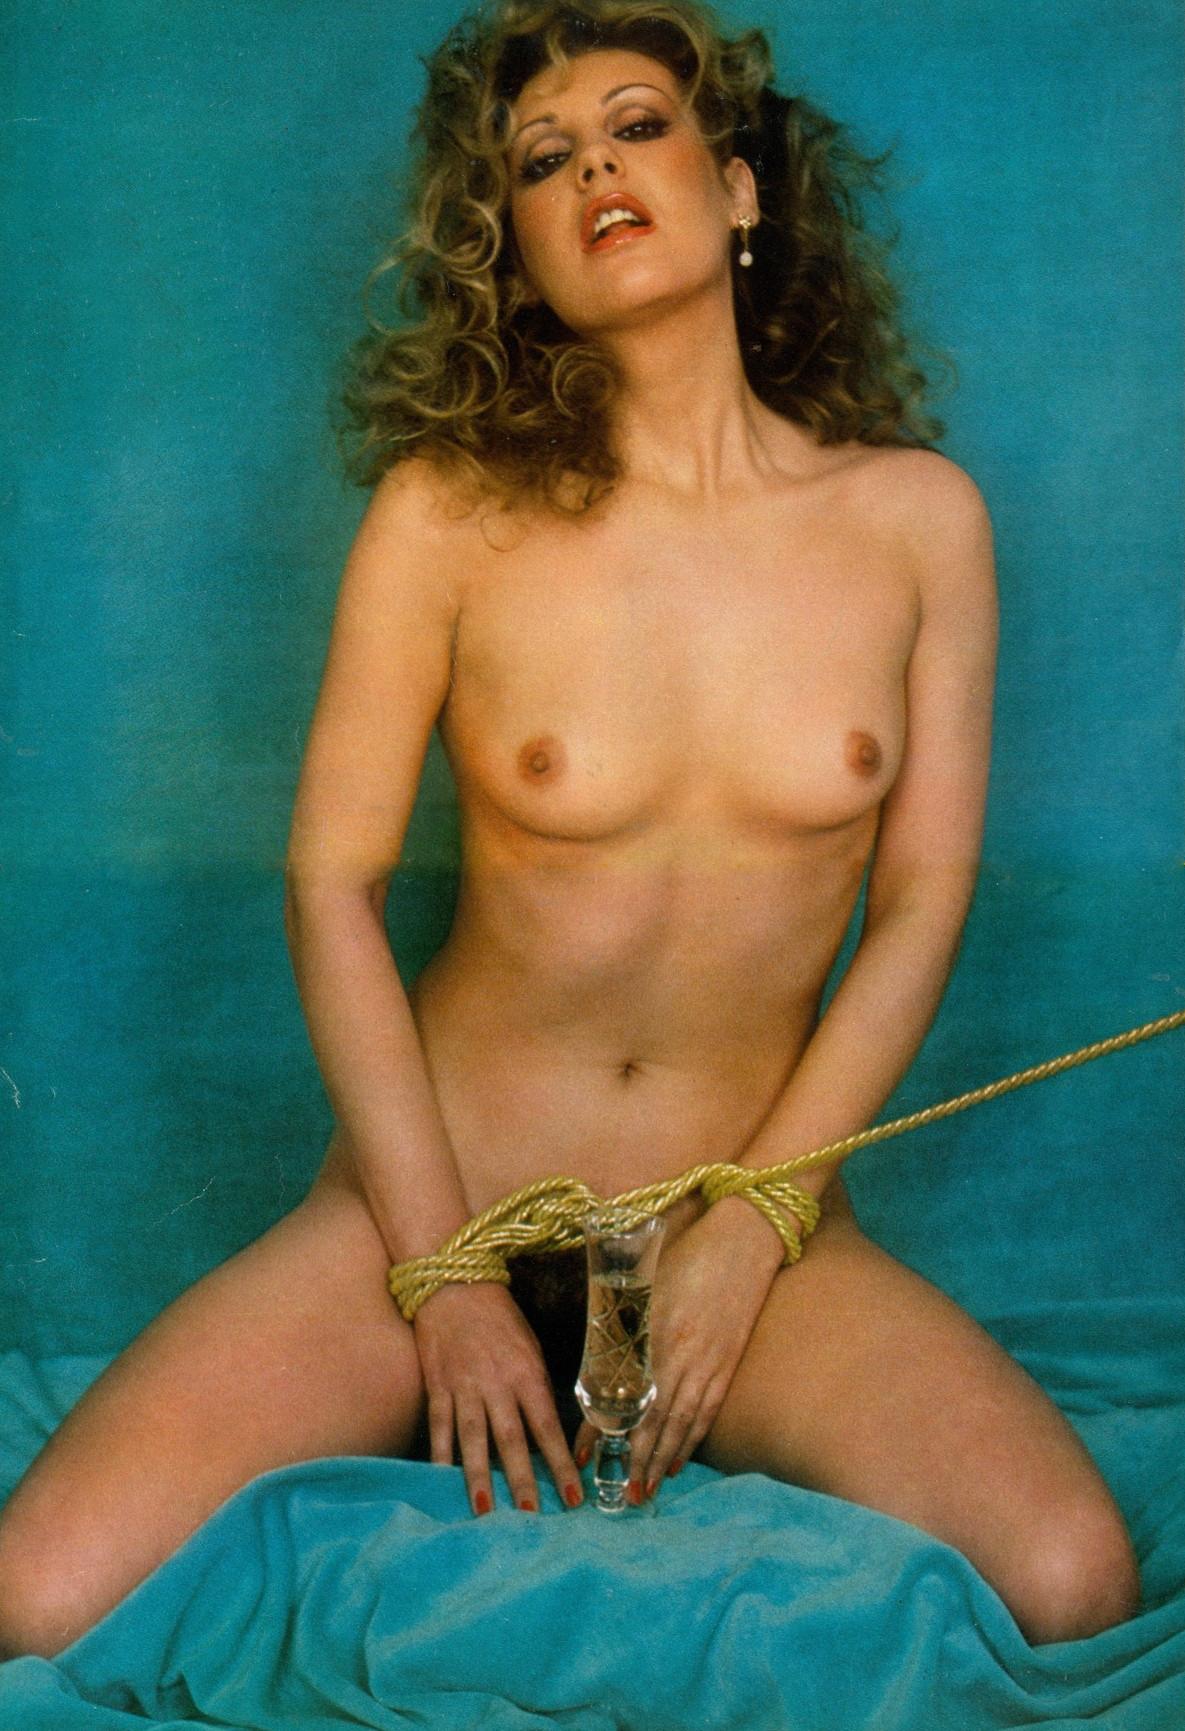 Annamaria Clementi E Deborah Cali Free Porn Galery